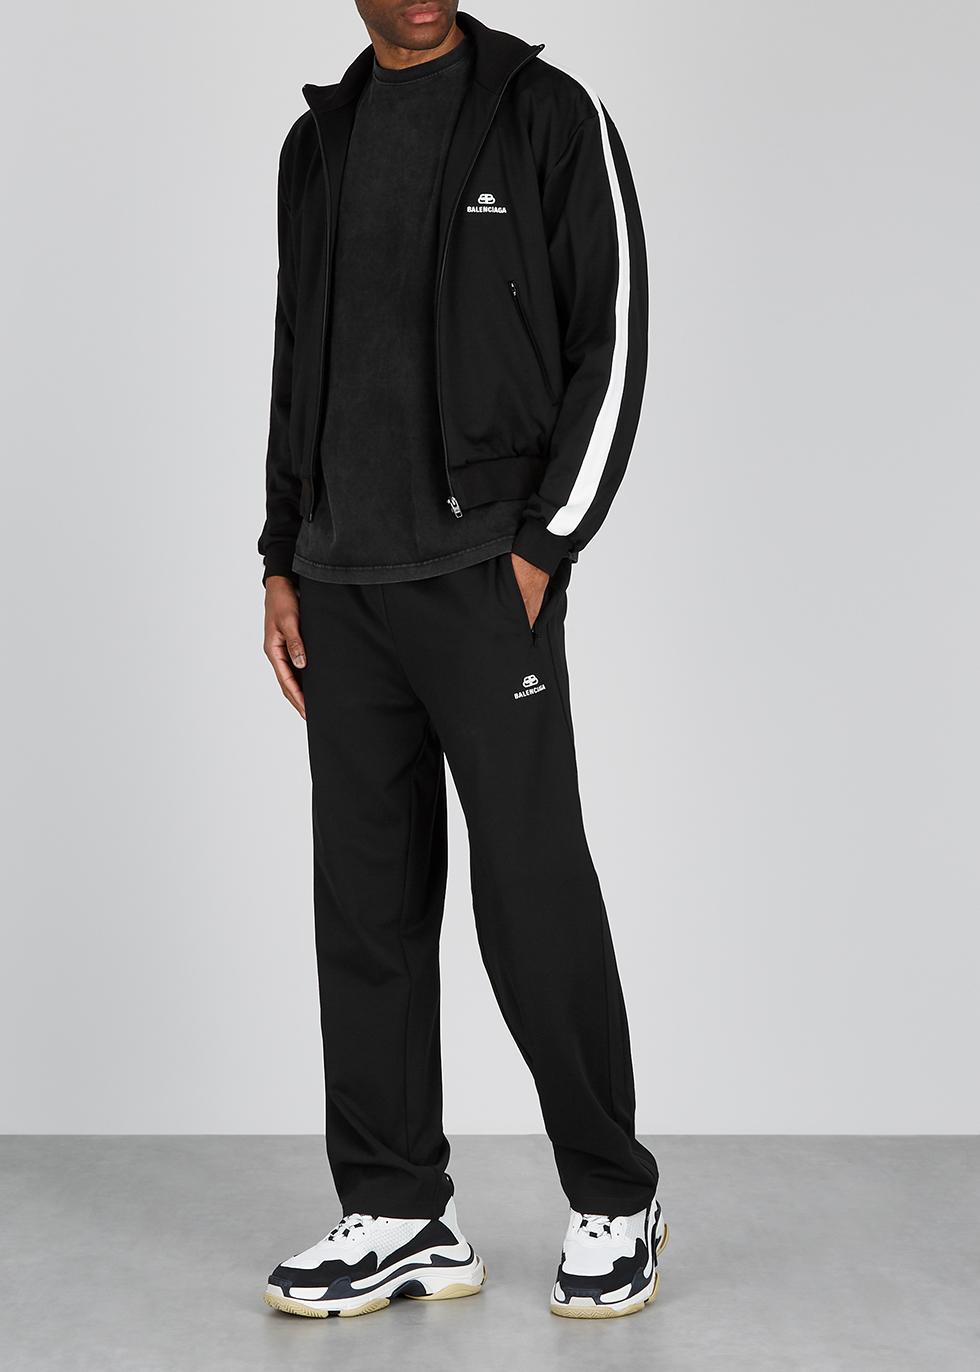 Balenciaga Monochrome jersey track top